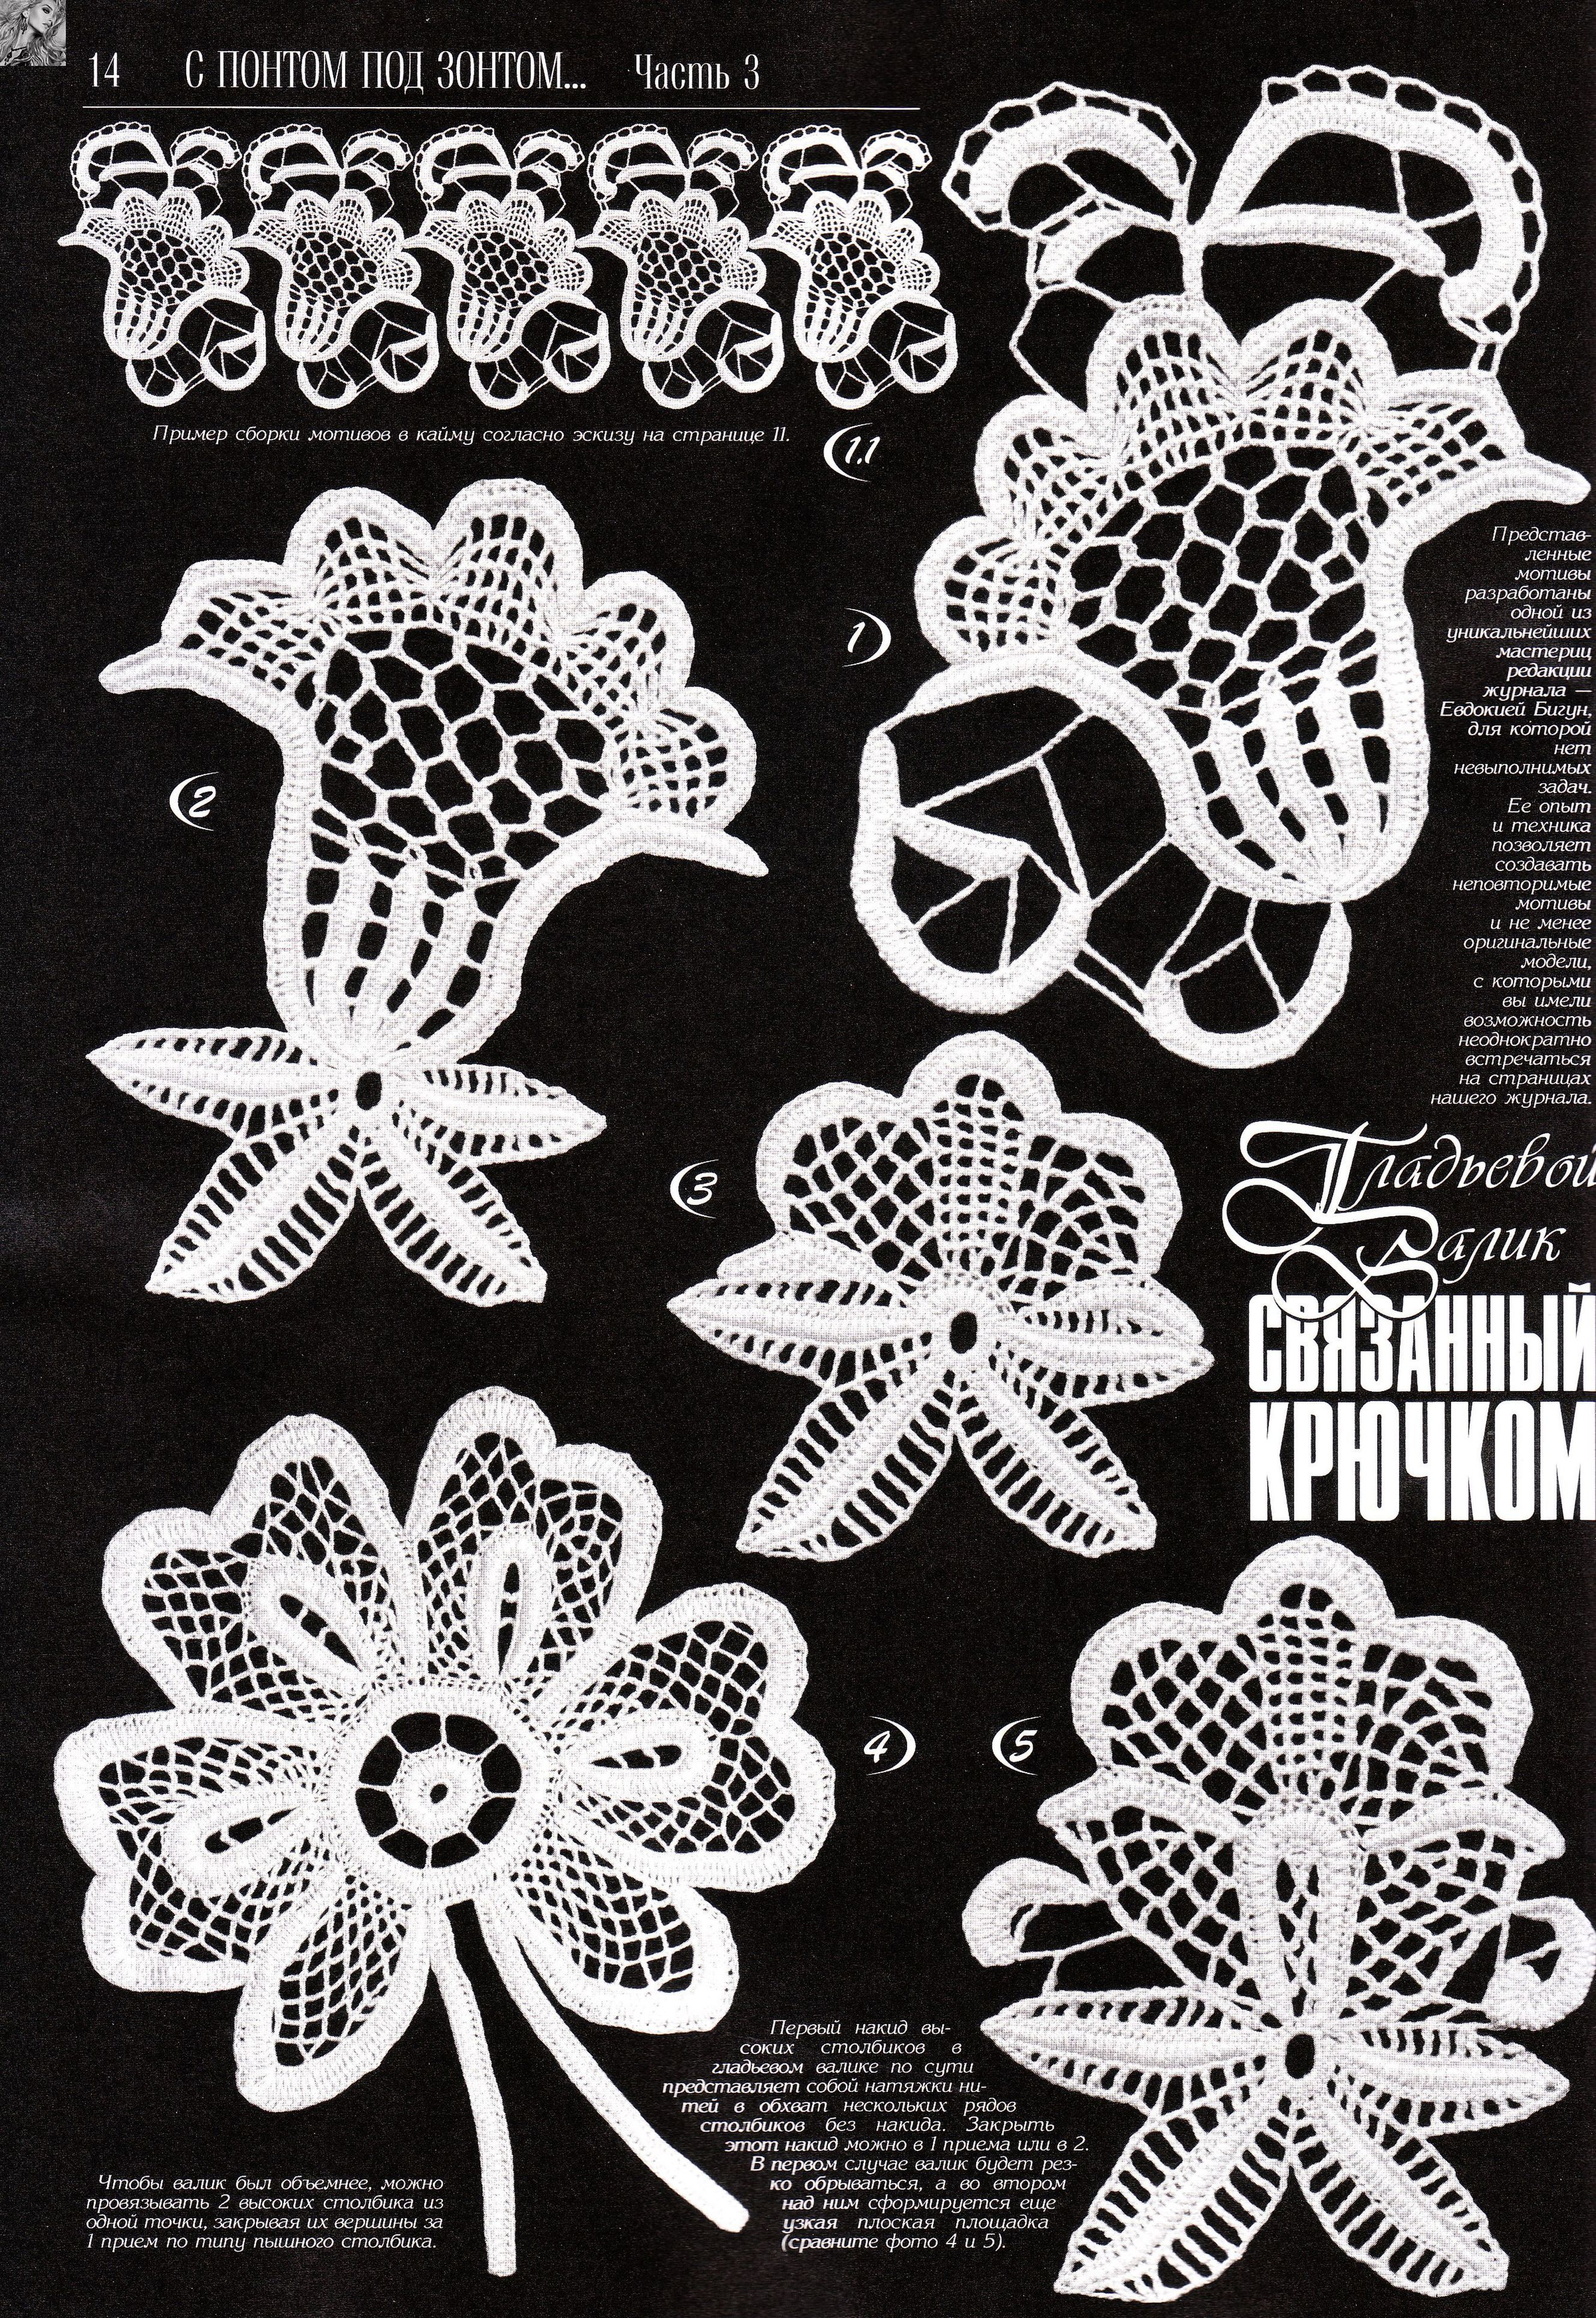 Pin de Marleen Peperstraete en irish crochet | Pinterest | Crochet ...